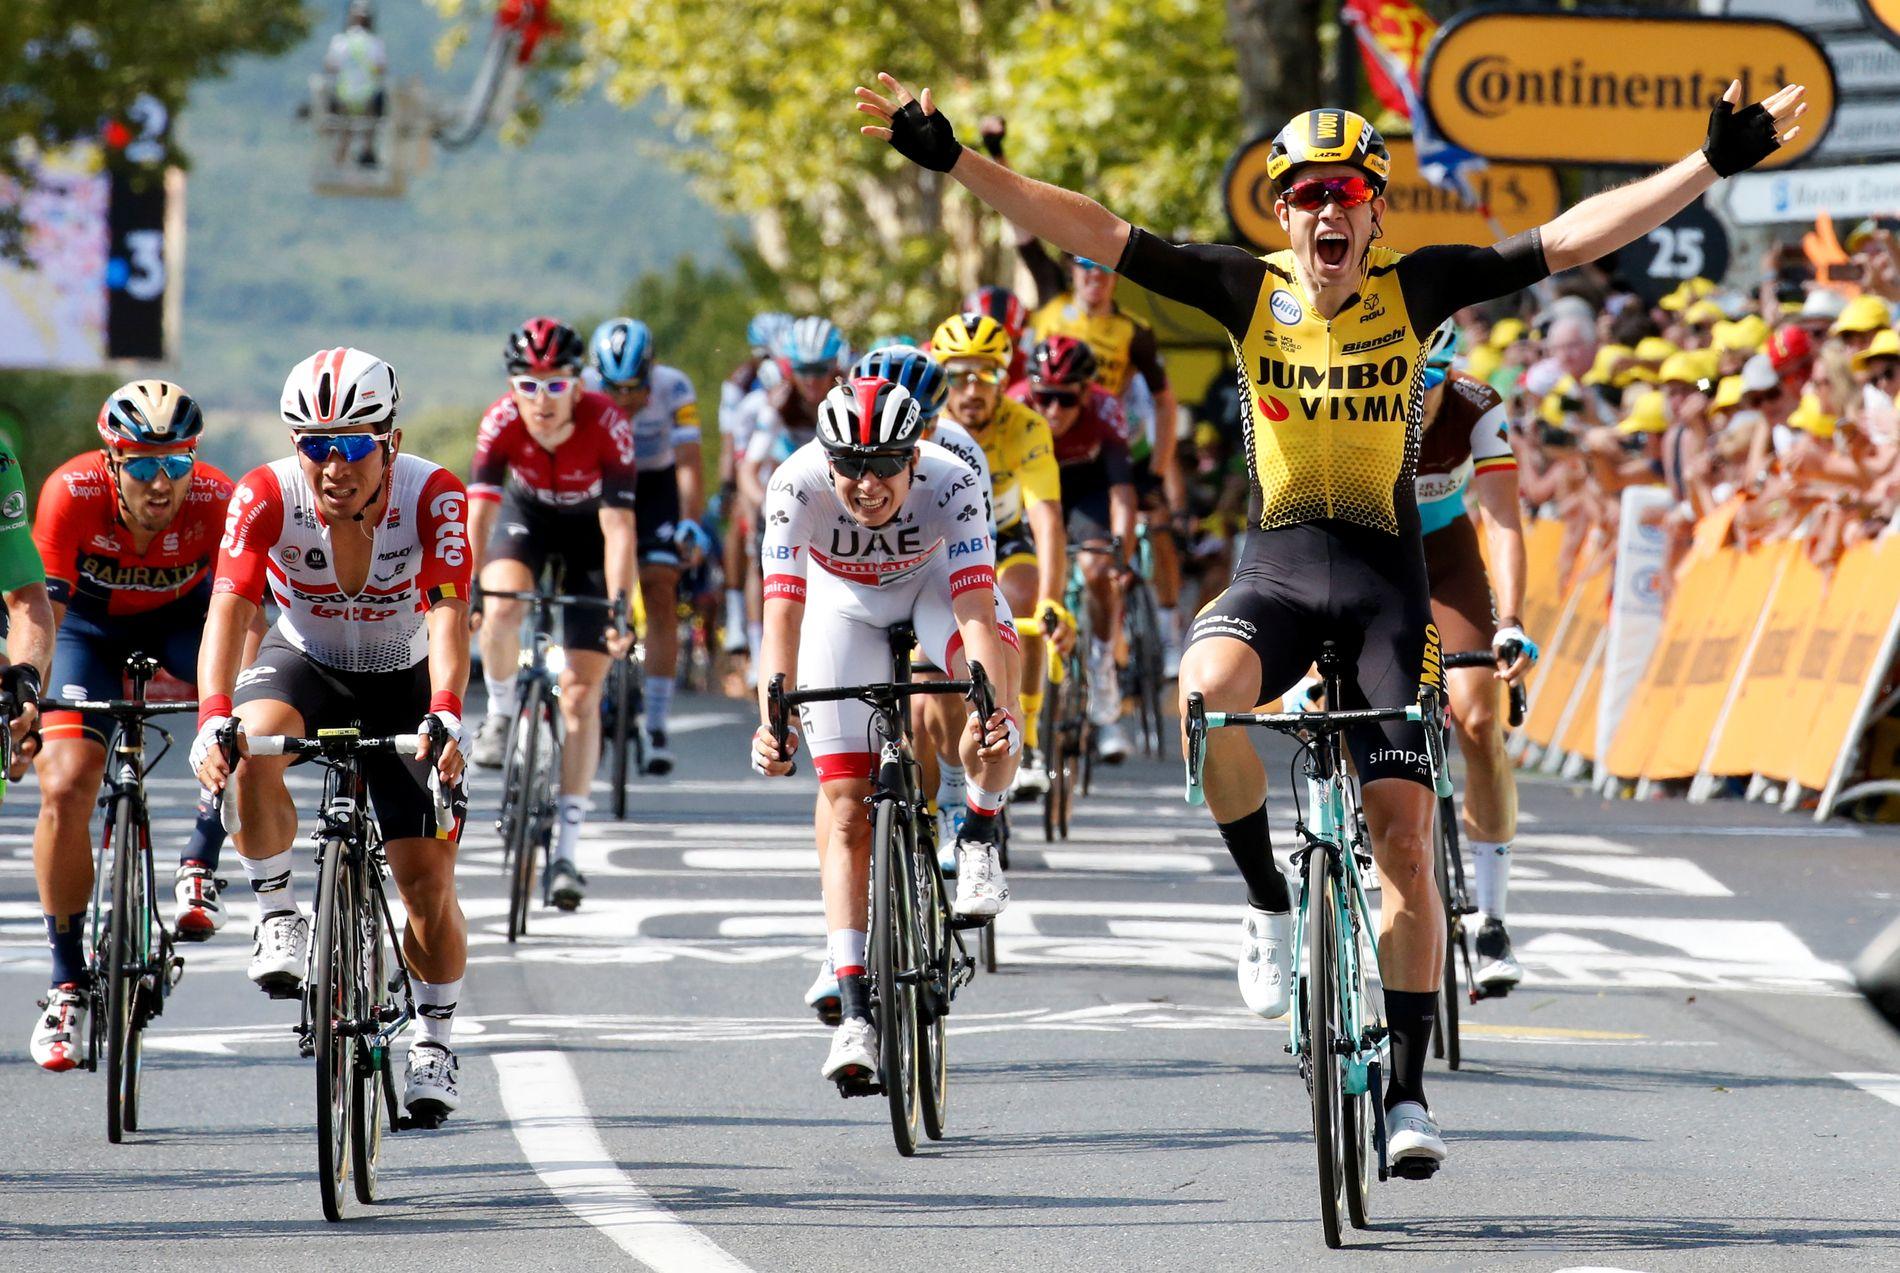 Wout van Aert vant én etappe under årets Tour de France, før han måtte bryte rittet.